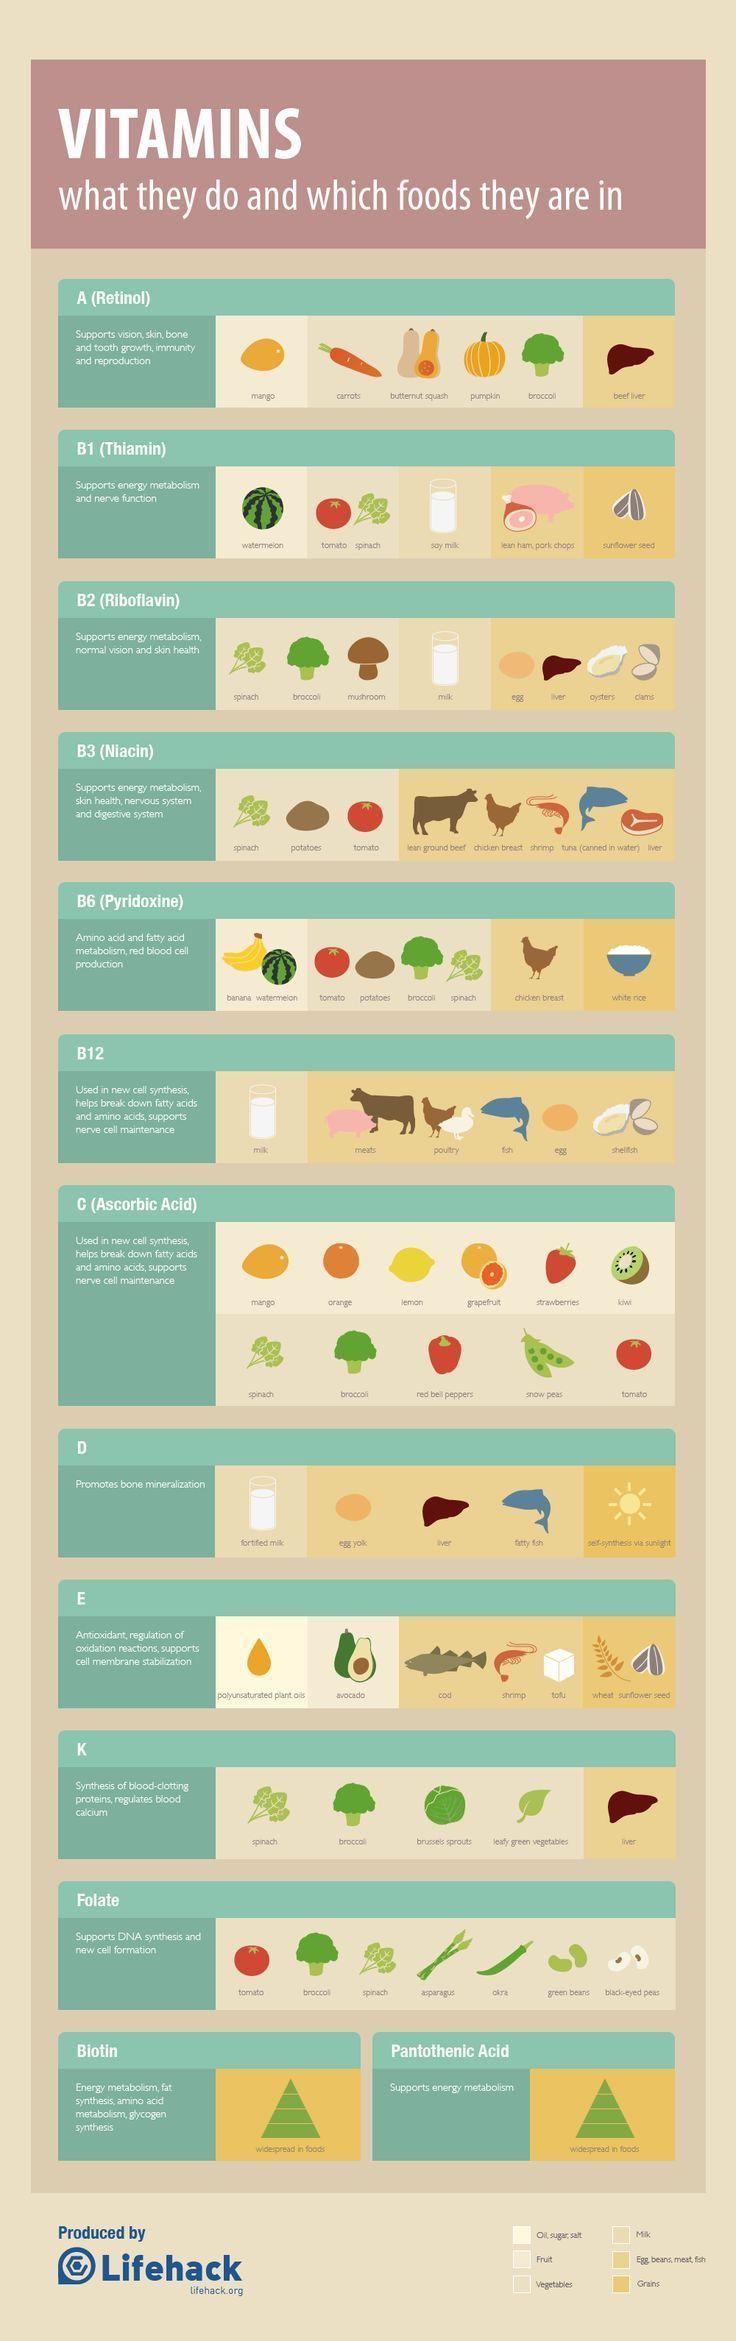 Great infographic to keep!   thebeautyspotqld.com.au #F4F #animals #tagforlikes #vitaminA #vitamins